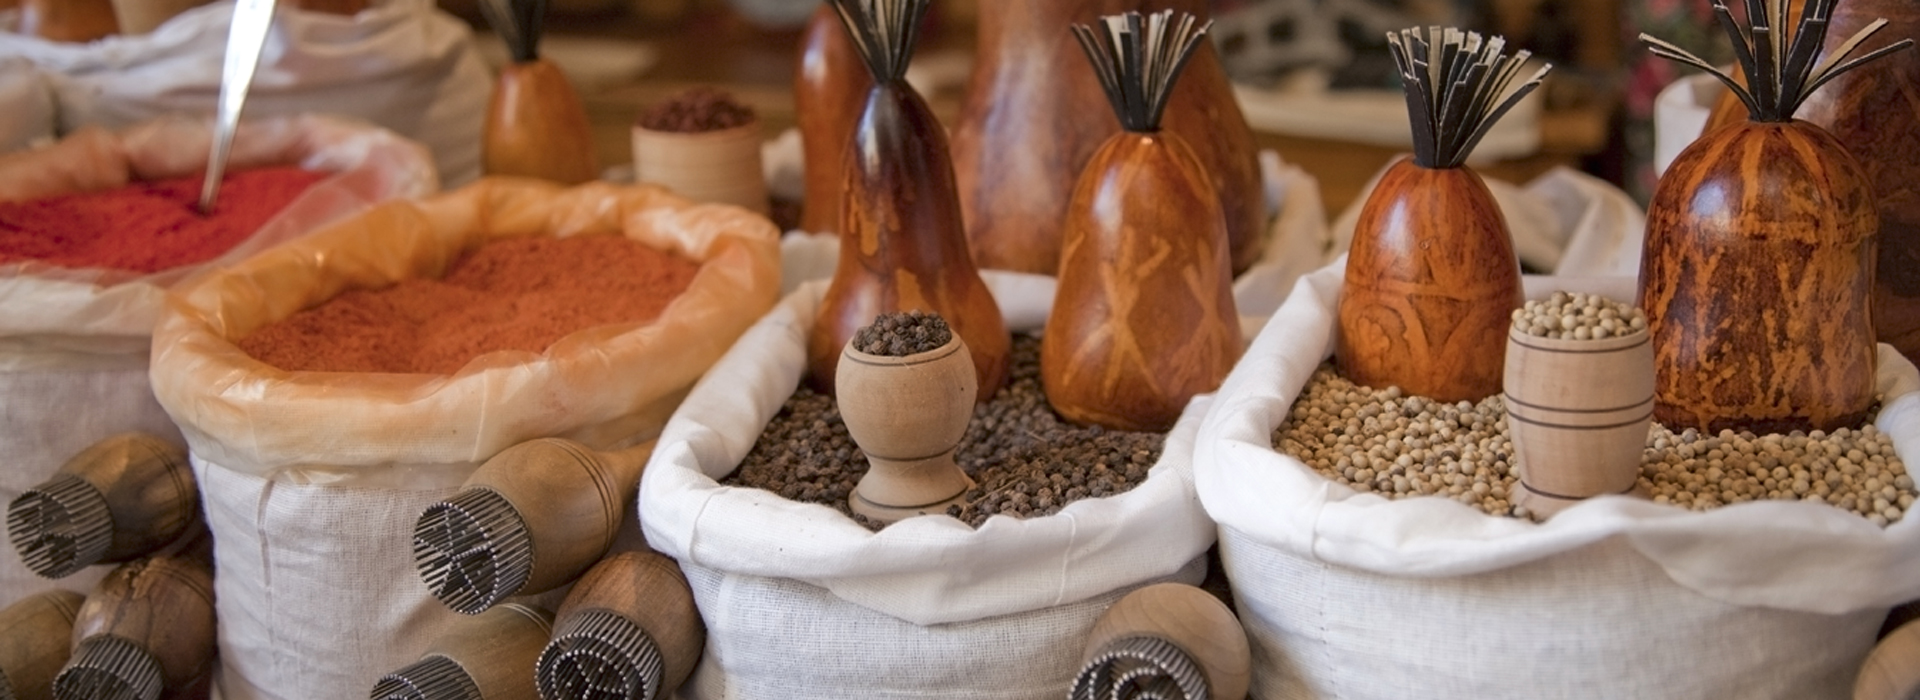 Spices-Uzbekistan-in-the-market